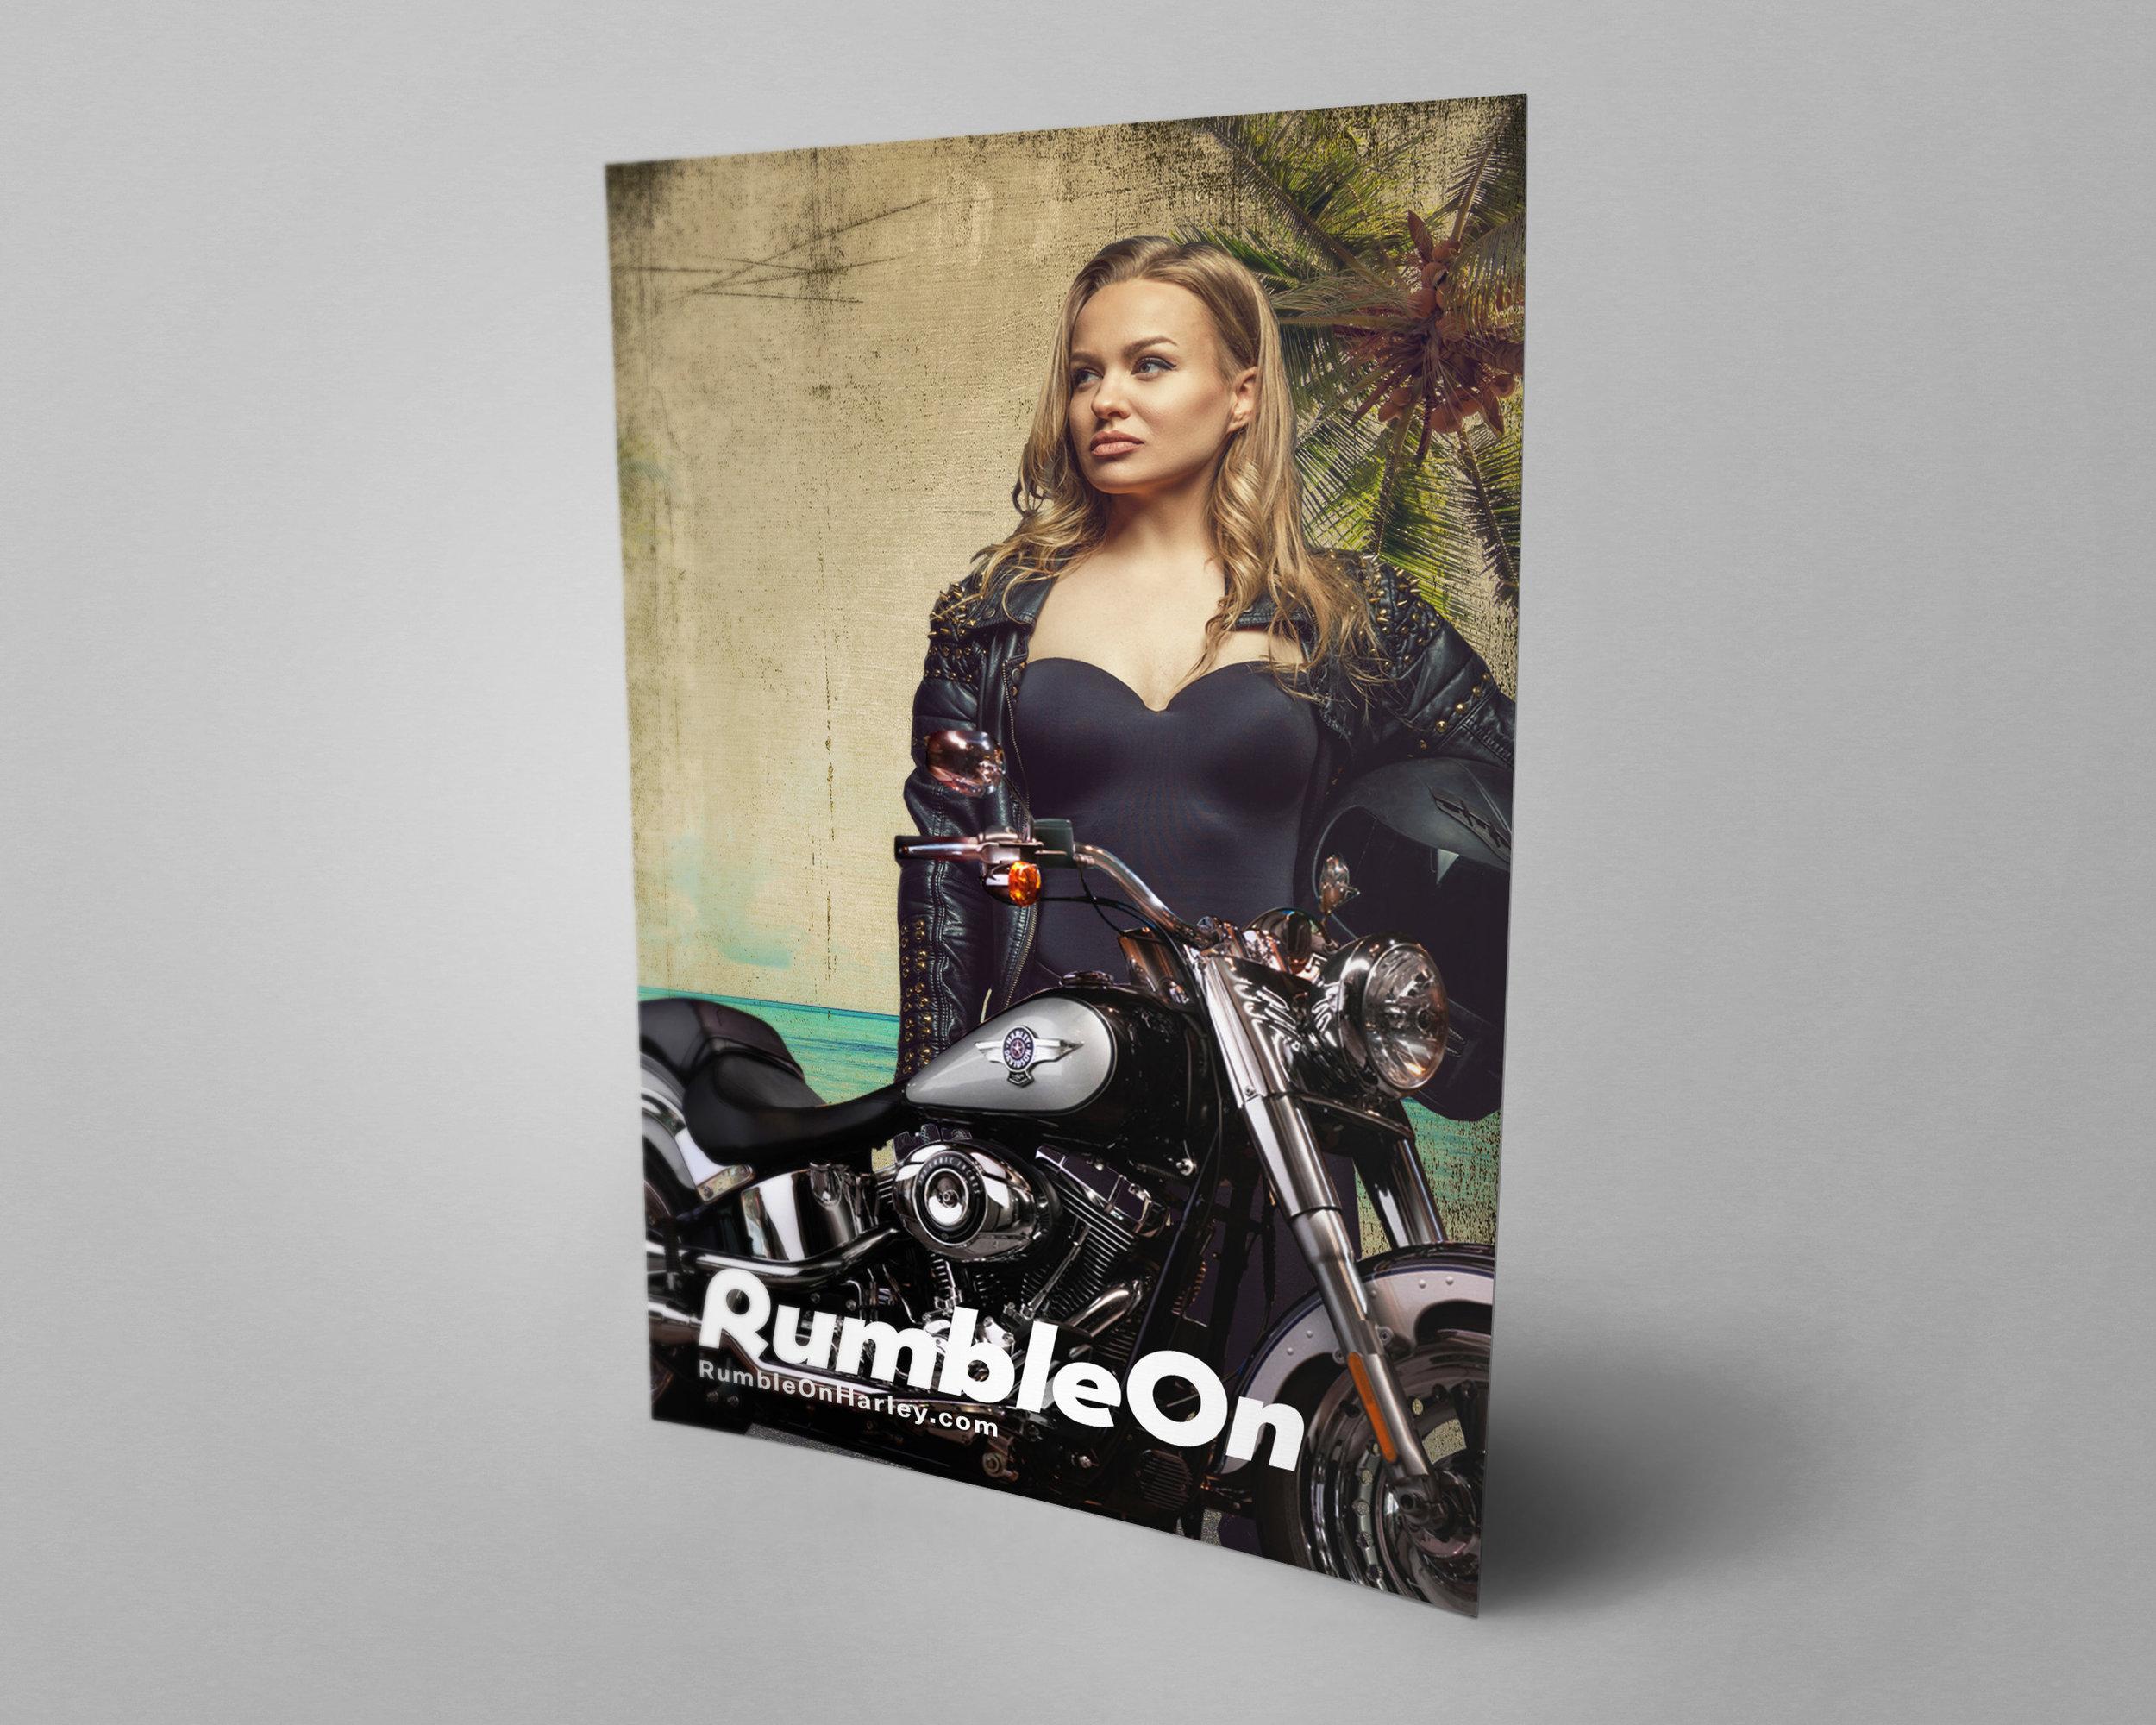 RumbleOn_Harley_JPG3d.jpg